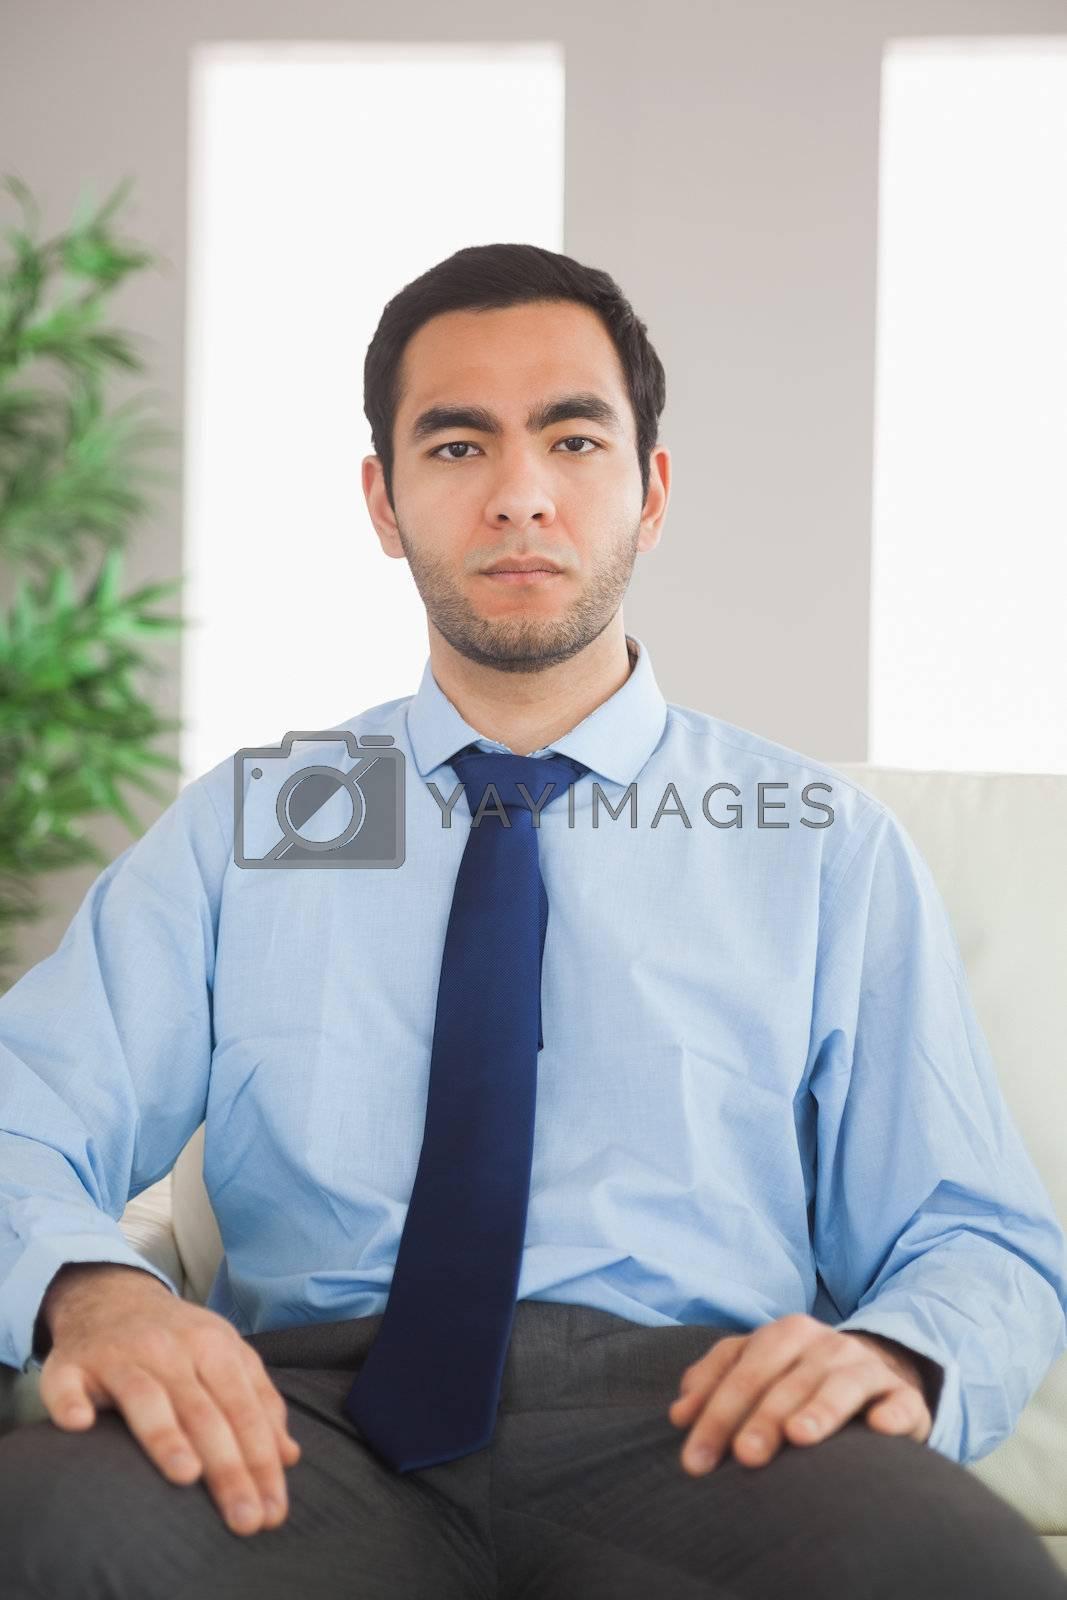 Serious classy businessman sitting on cosy sofa by Wavebreakmedia